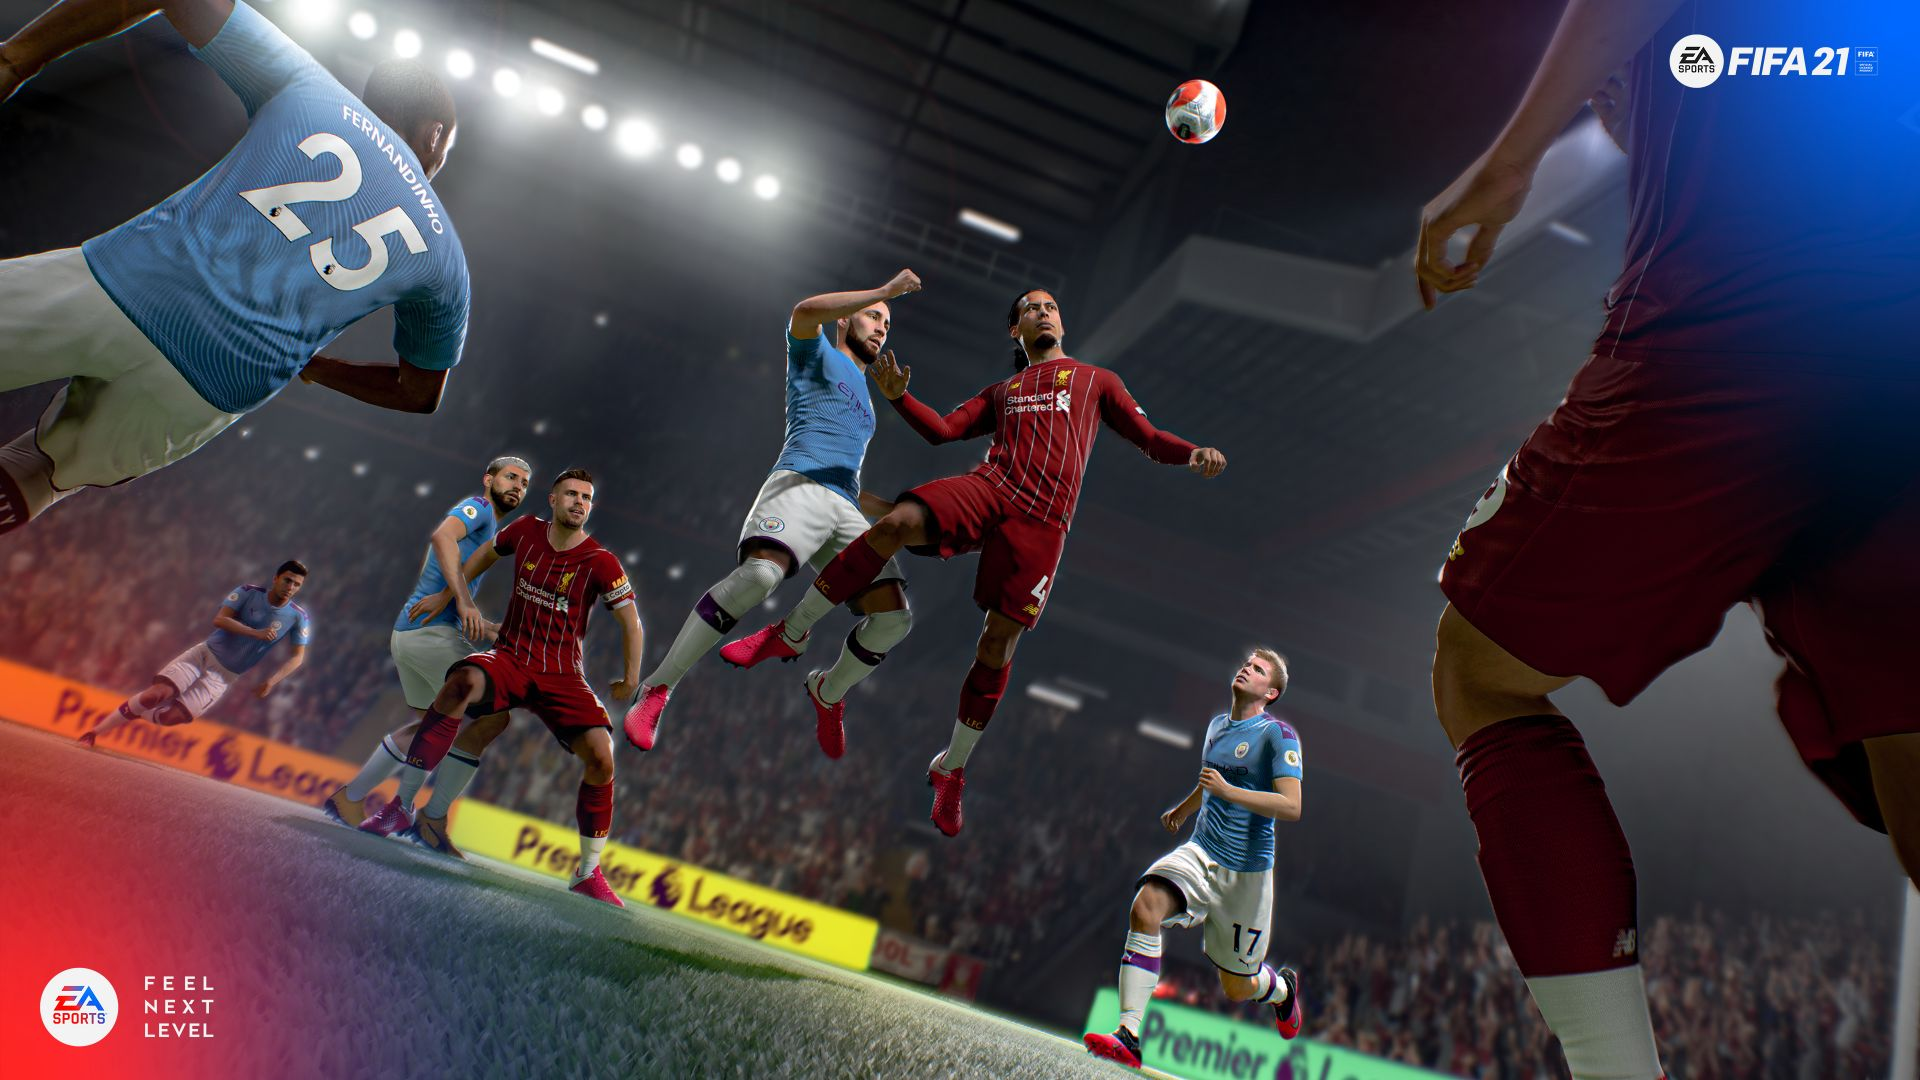 Wallpaper FIFA 21, screenshot, 4K, Games #23013